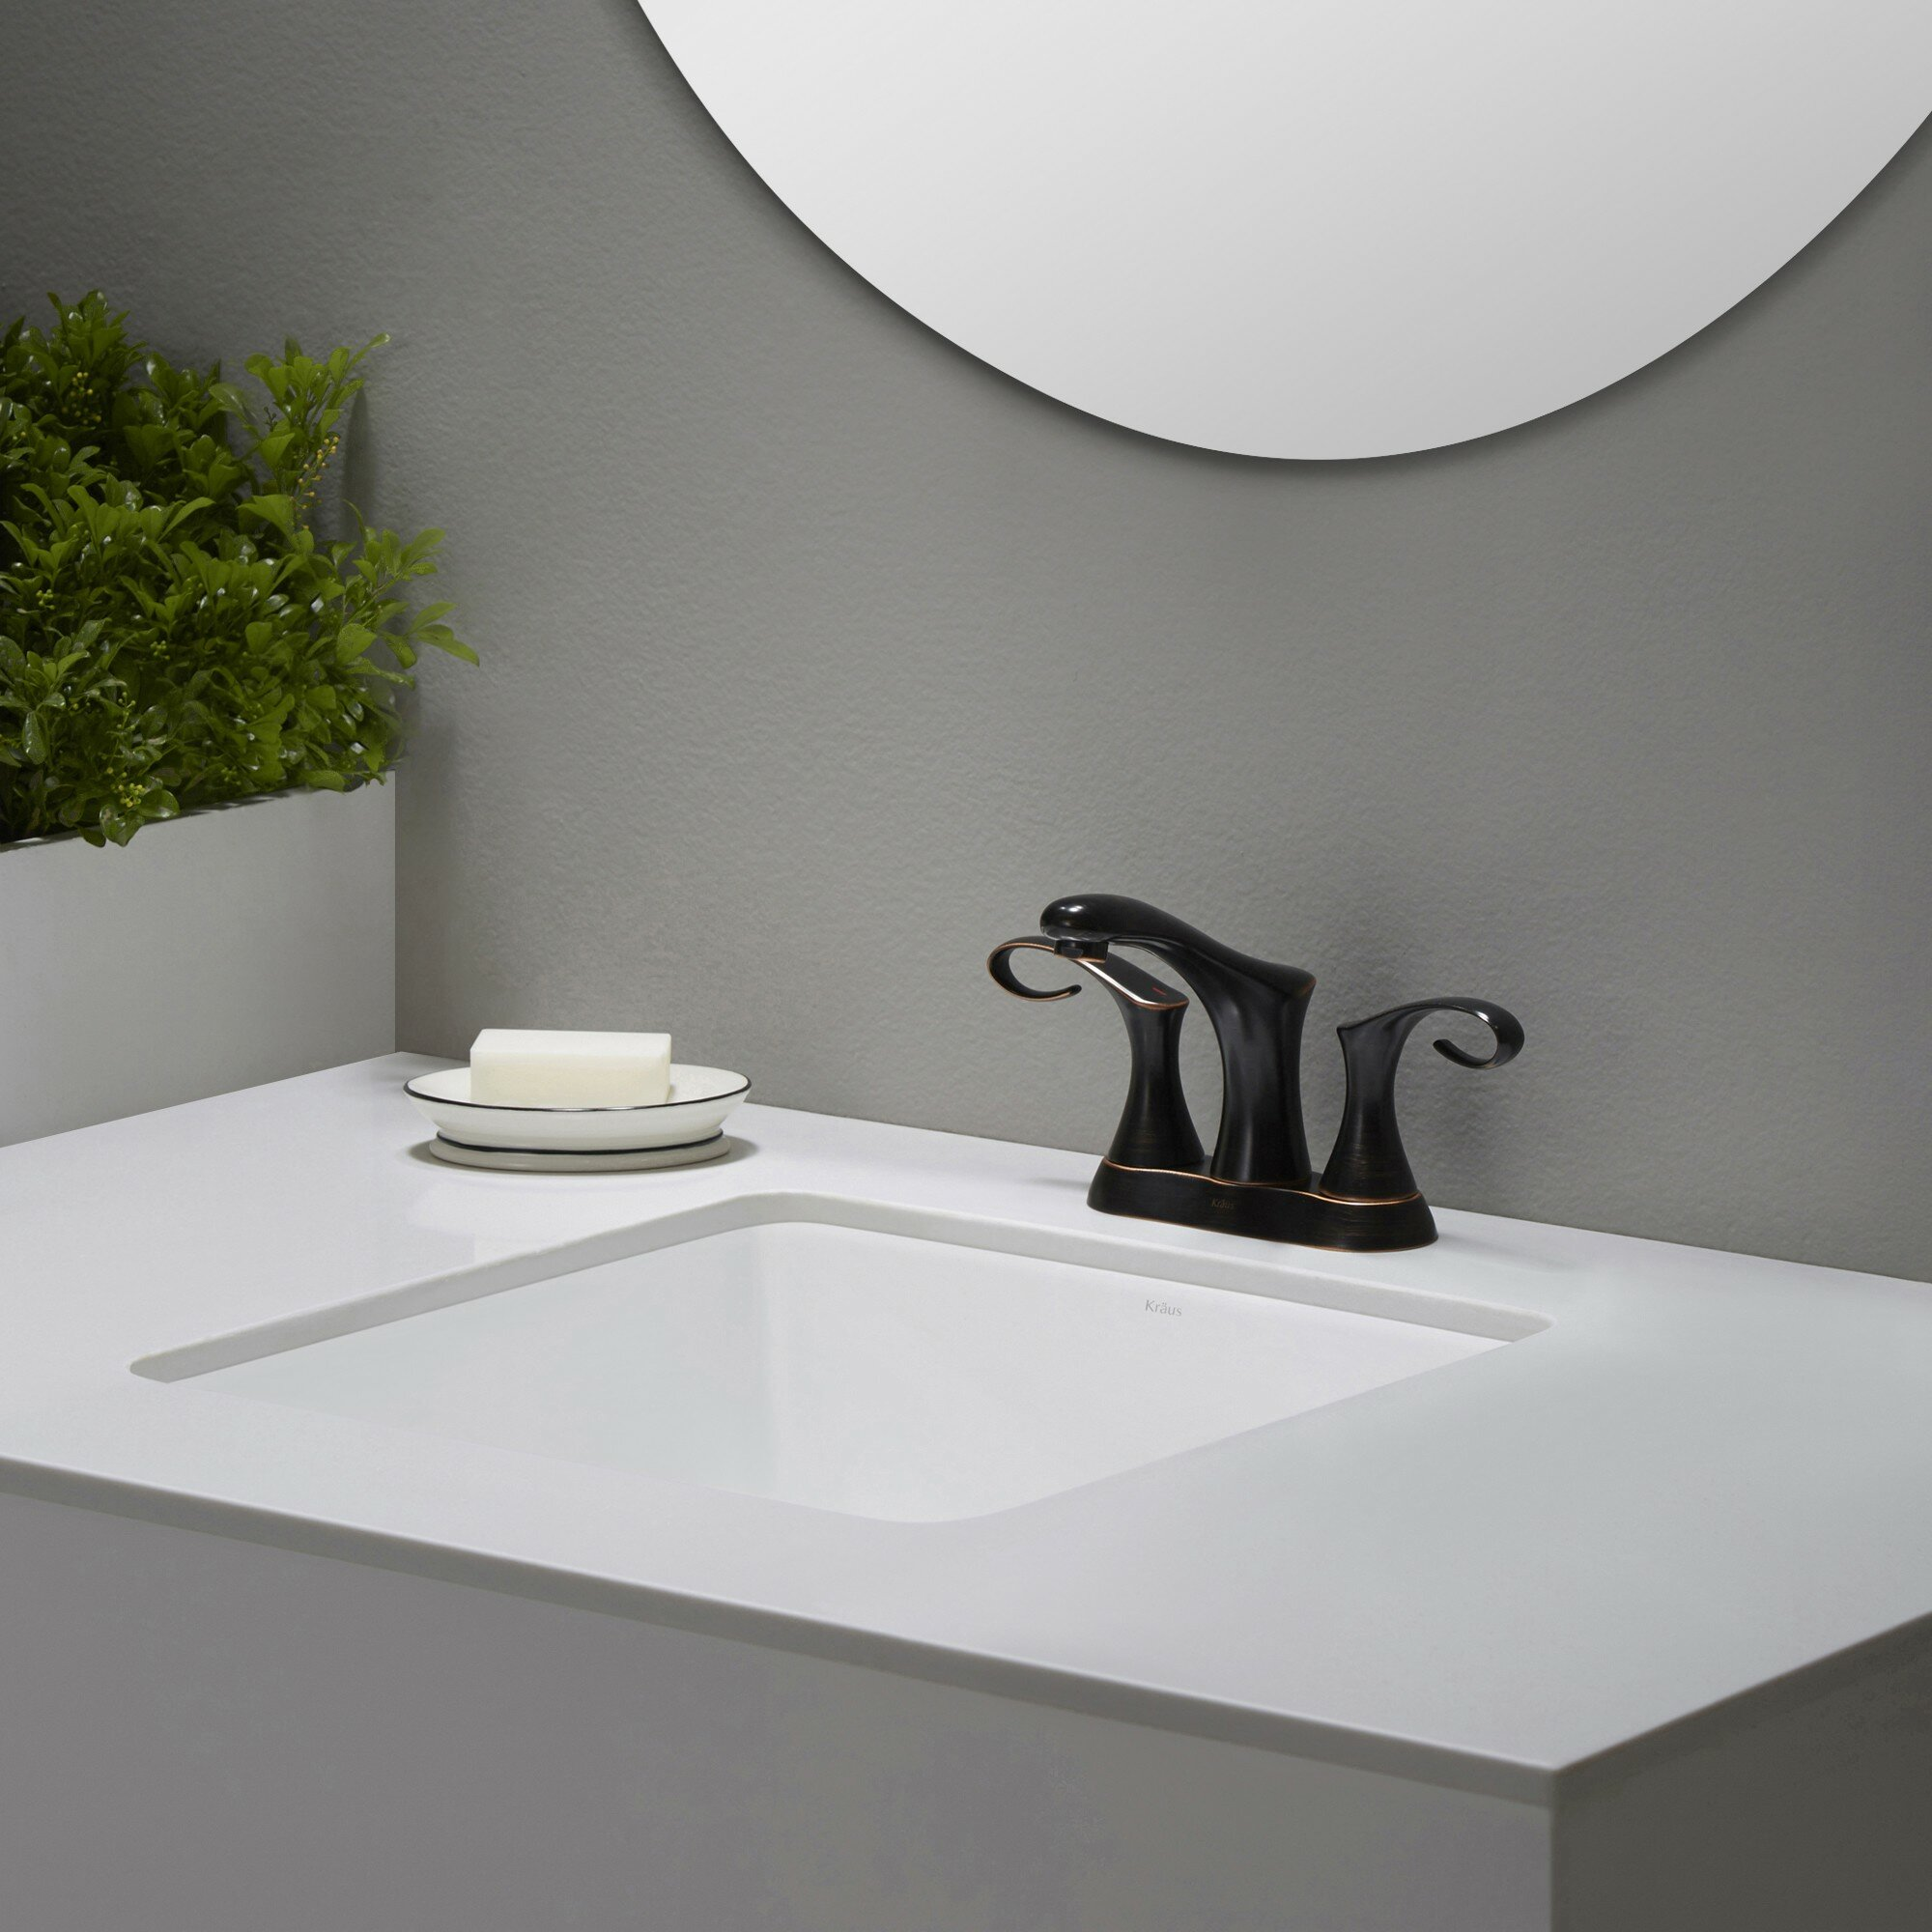 Kraus Elavo Ceramic Square Undermount Bathroom Sink With Overflow Reviews Wayfair